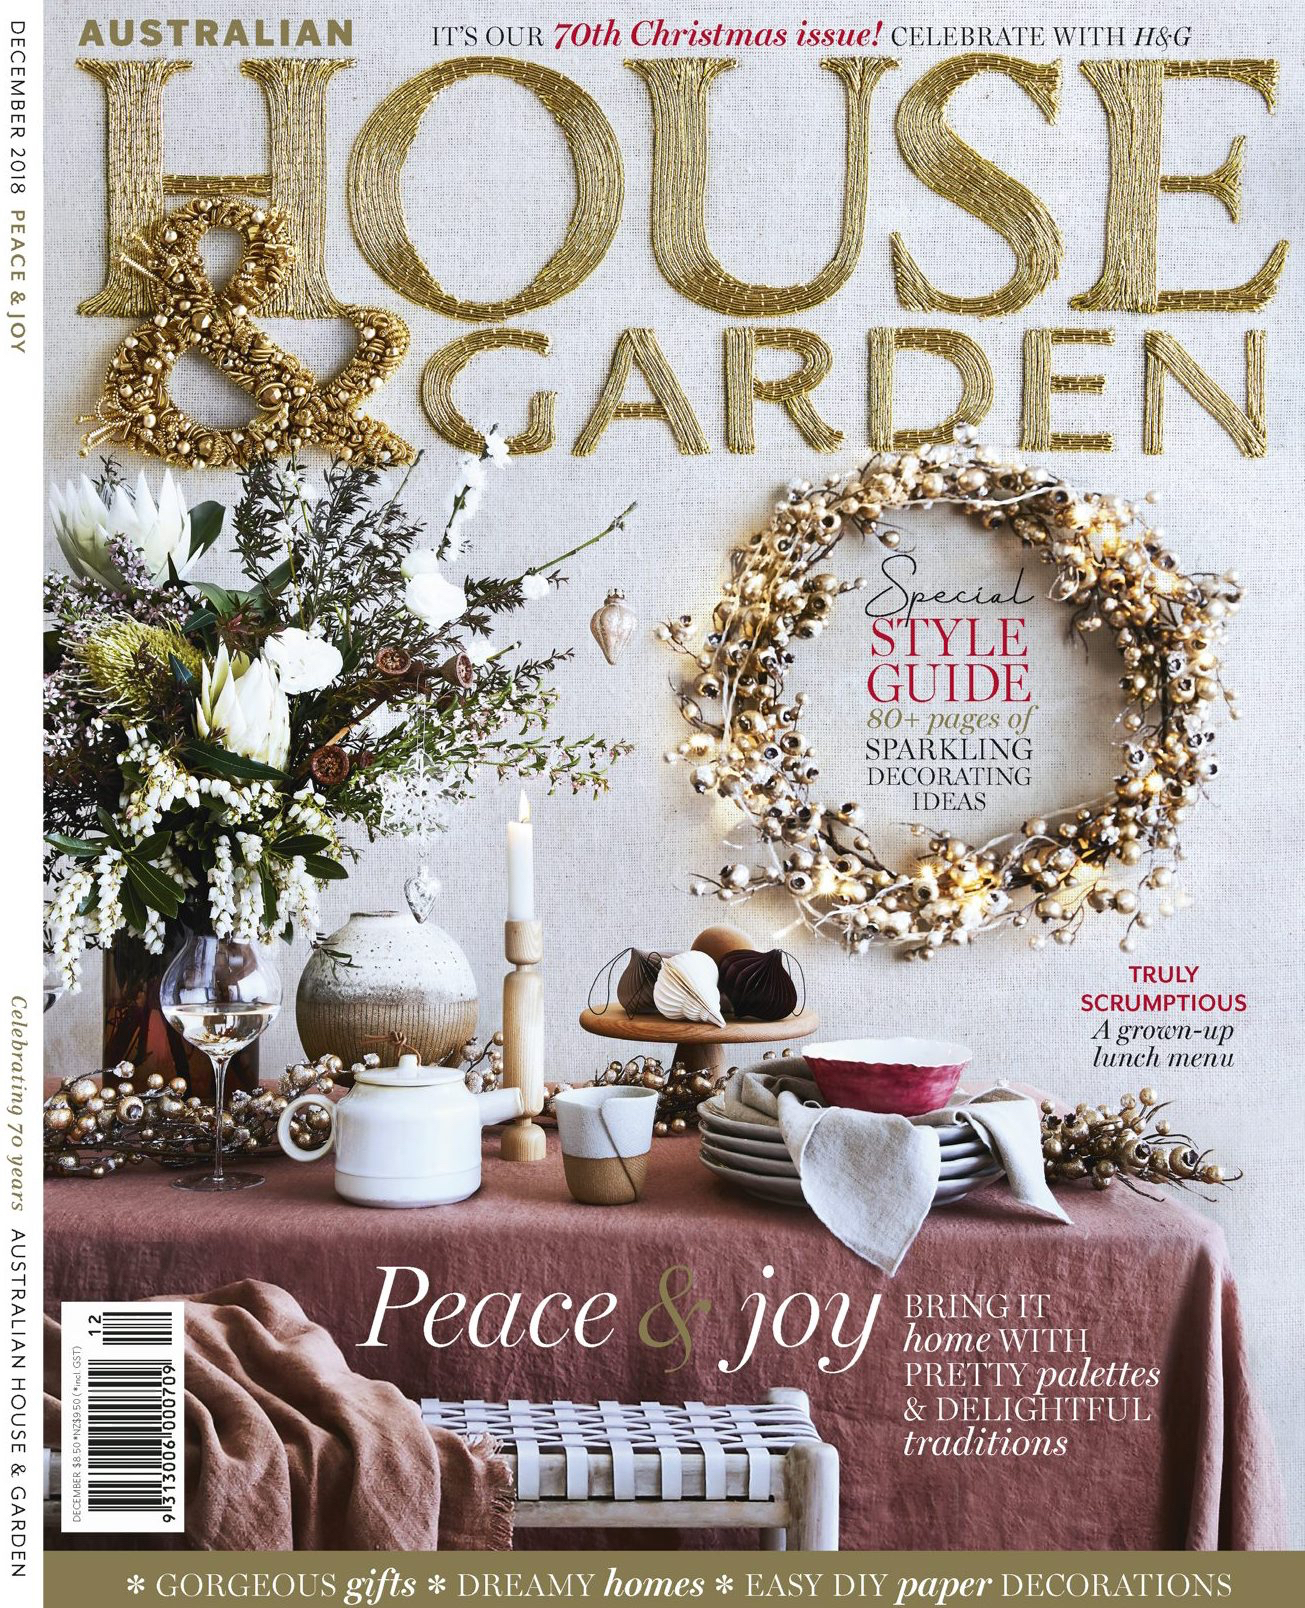 As seen in the Australian House & Garden magazine 70th Christmas edition